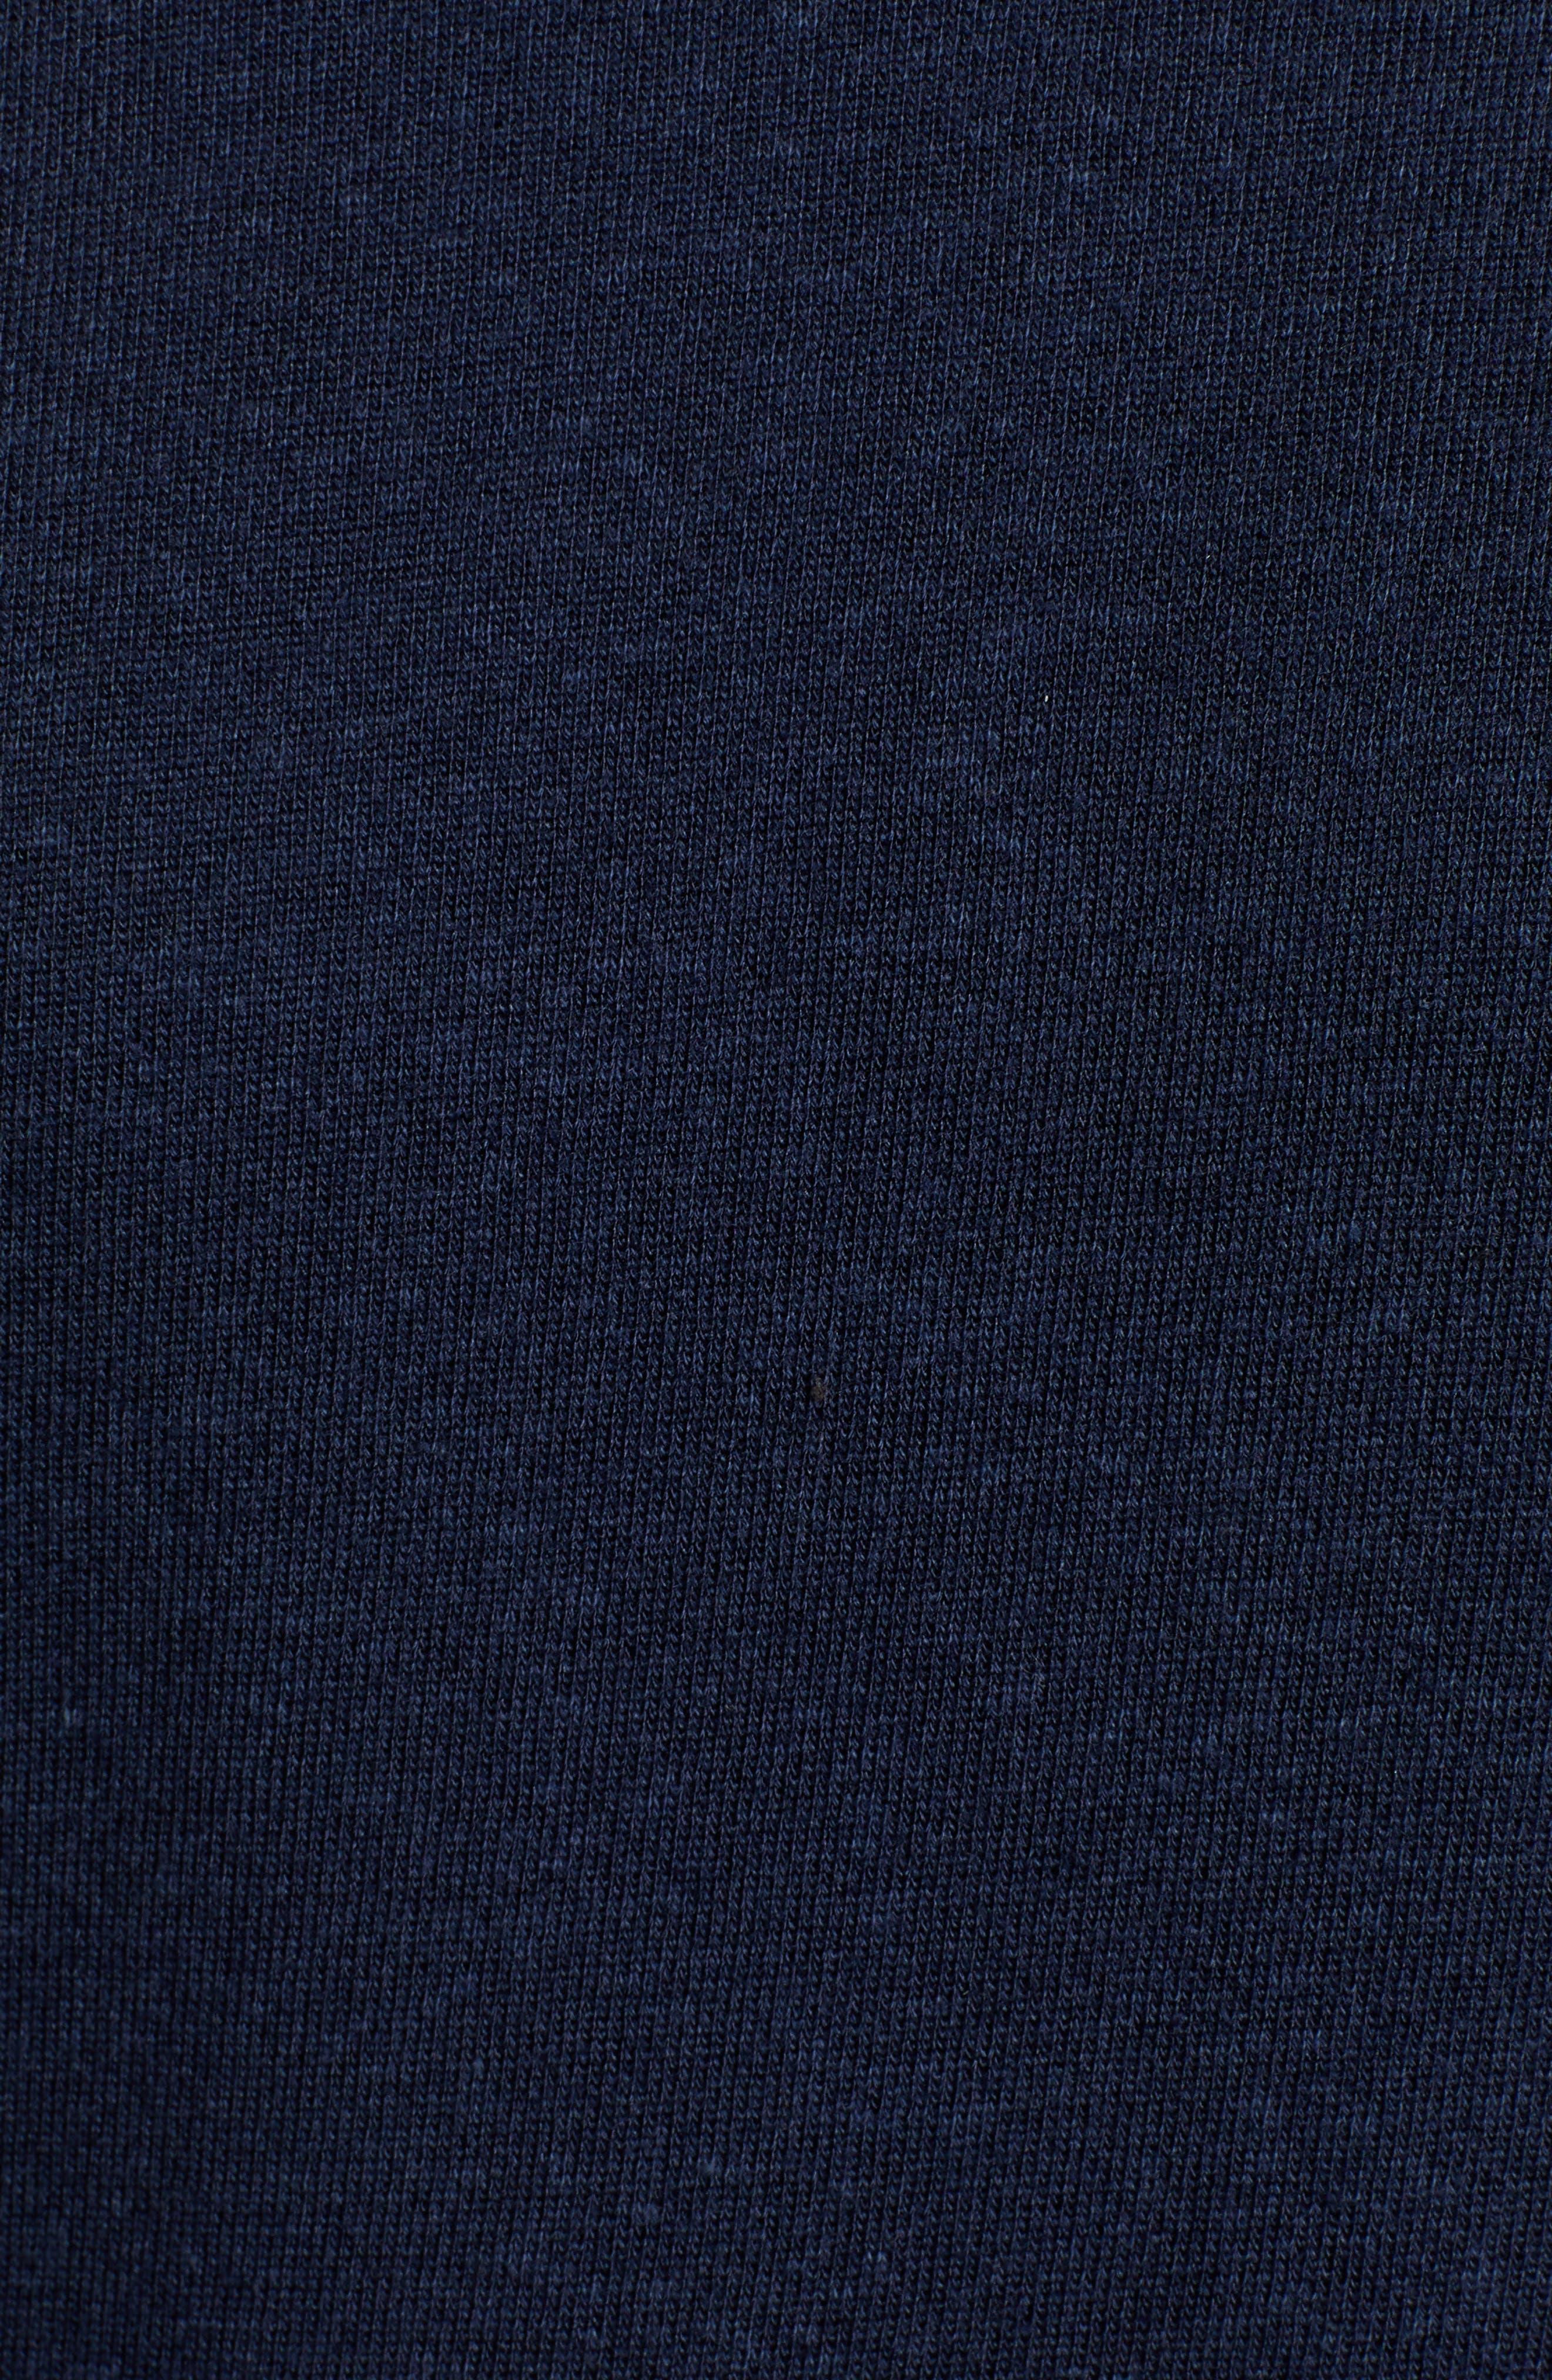 Midnight Stripe Cuff Cotton Blend Sweatshirt,                             Alternate thumbnail 5, color,                             415